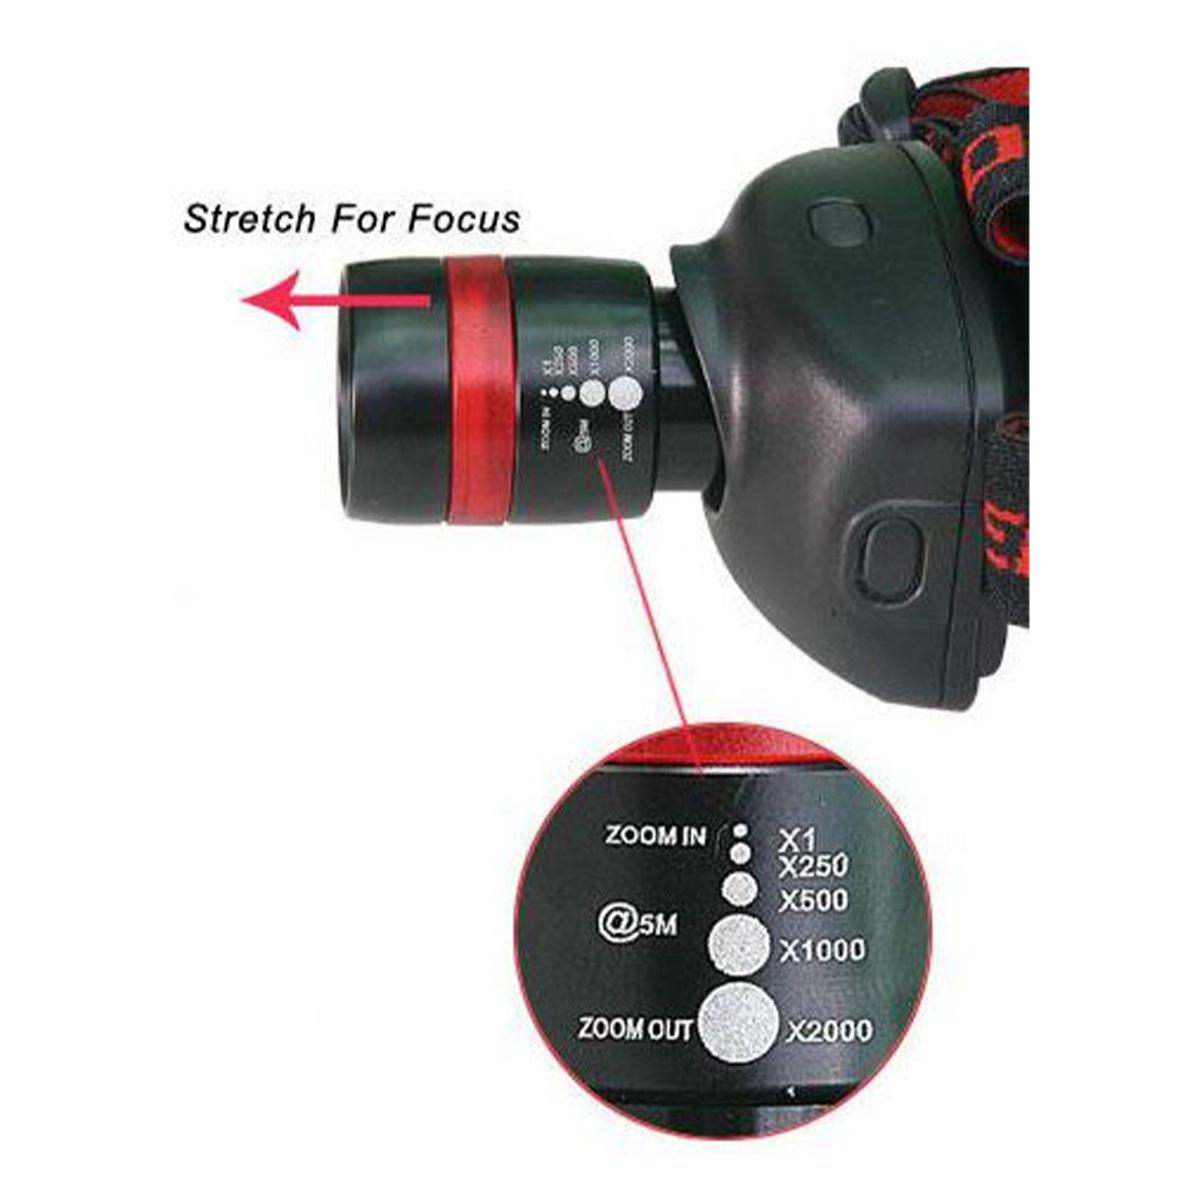 43-2032-led-stirnlampe-lumatic-head-super-focus-ansicht-1200x1200px.jpg